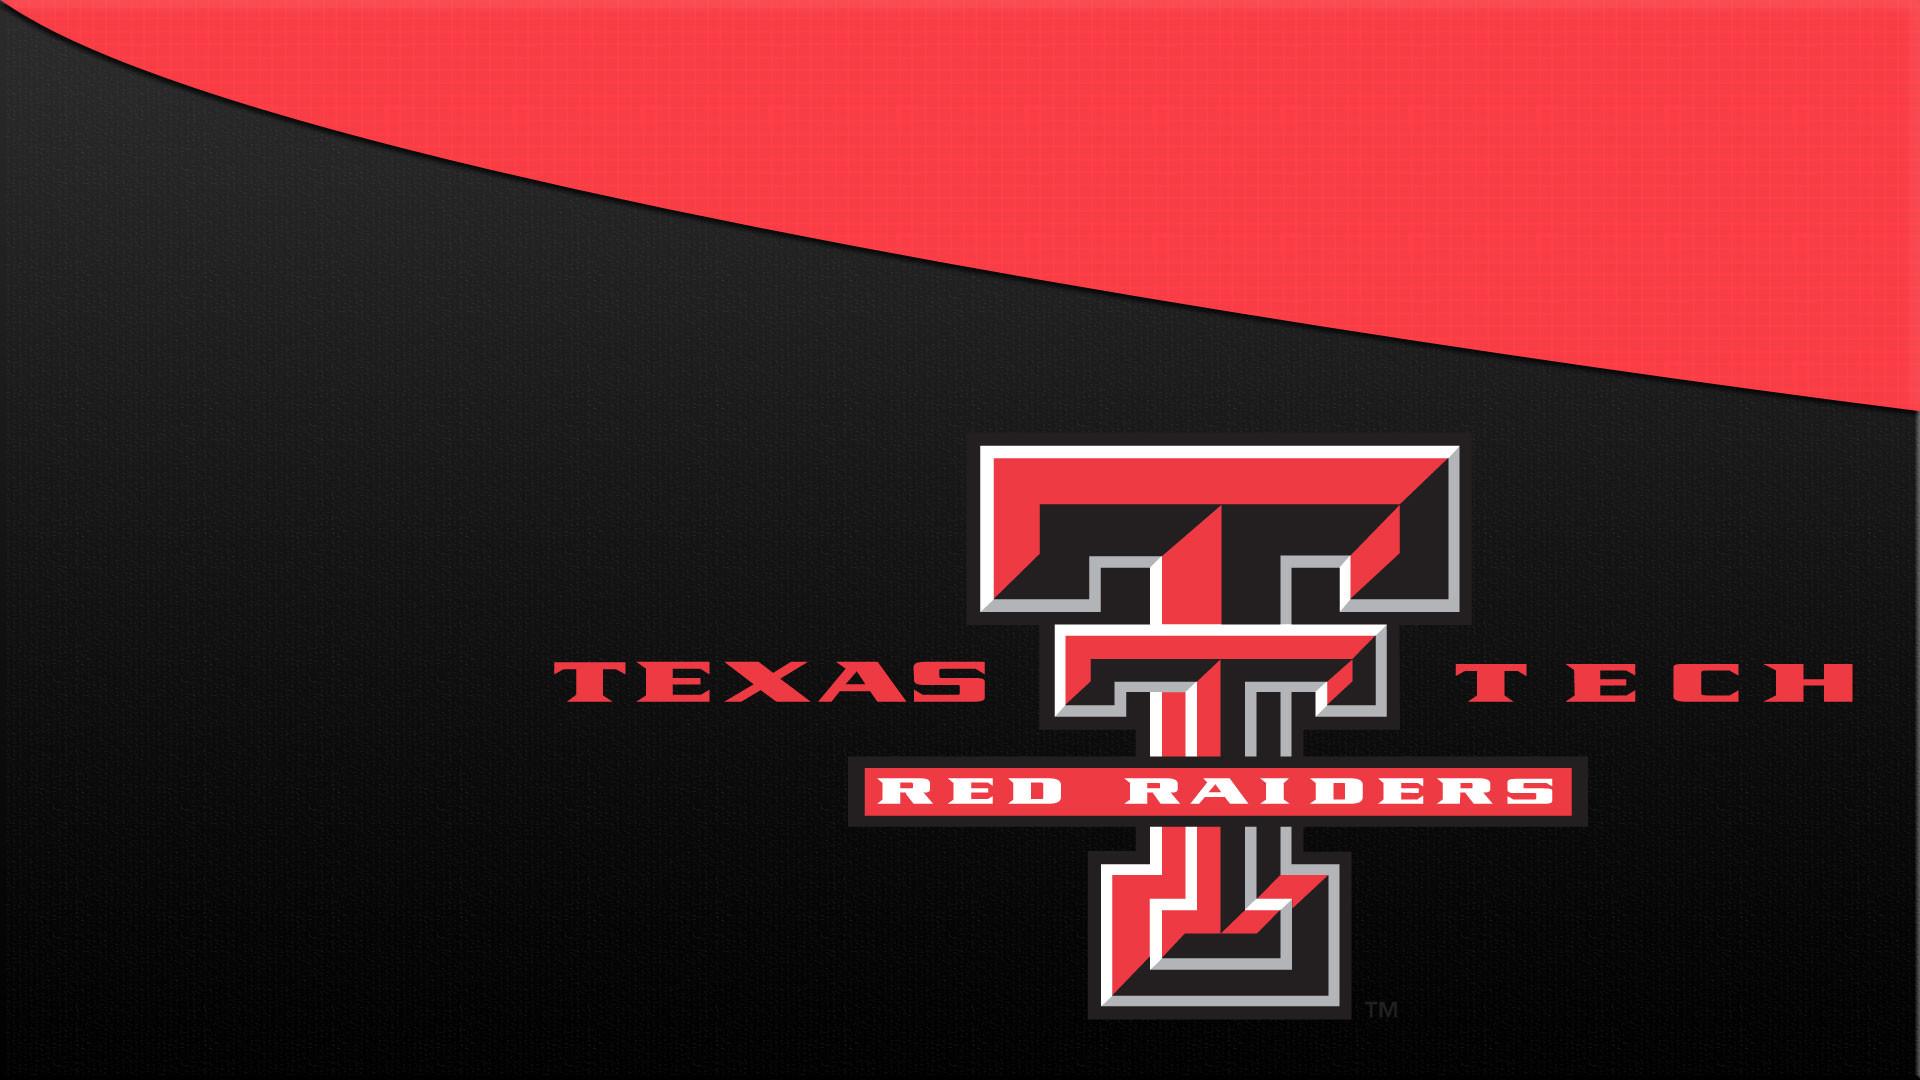 Texas Tech Red Raiders Wallpaper #1